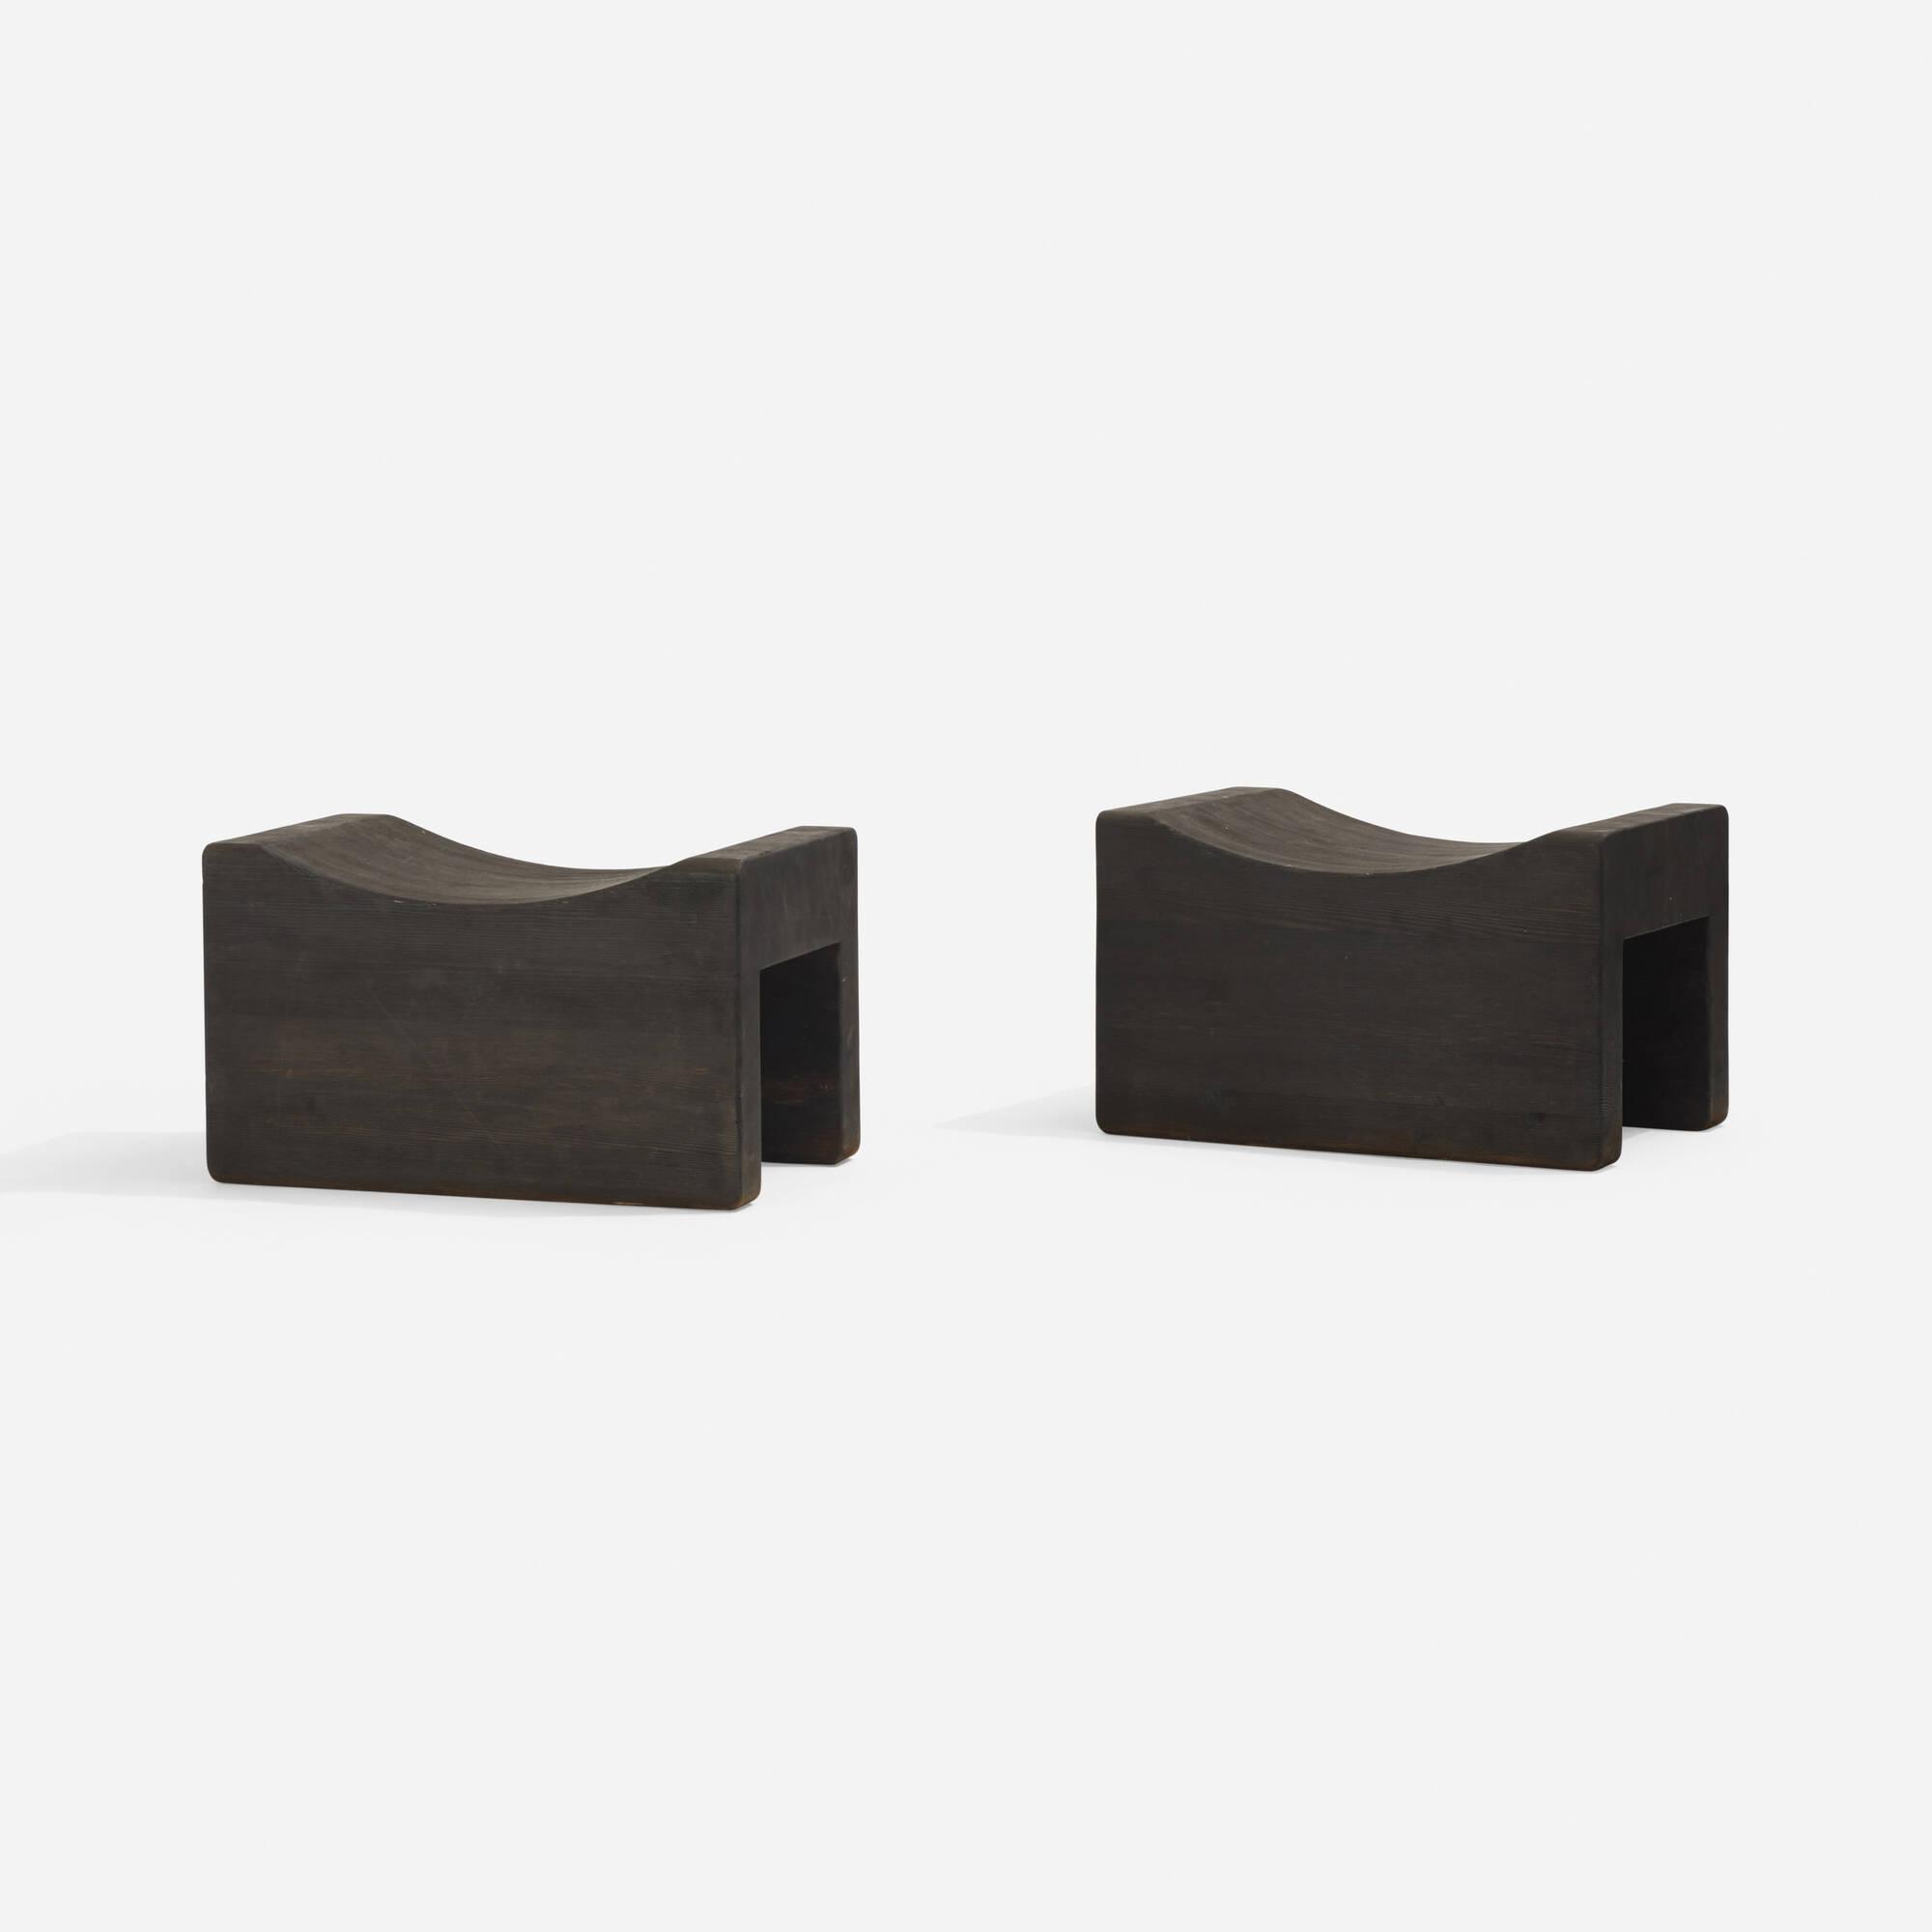 124: Axel Einar Hjorth / Utö stools, pair (2 of 3)